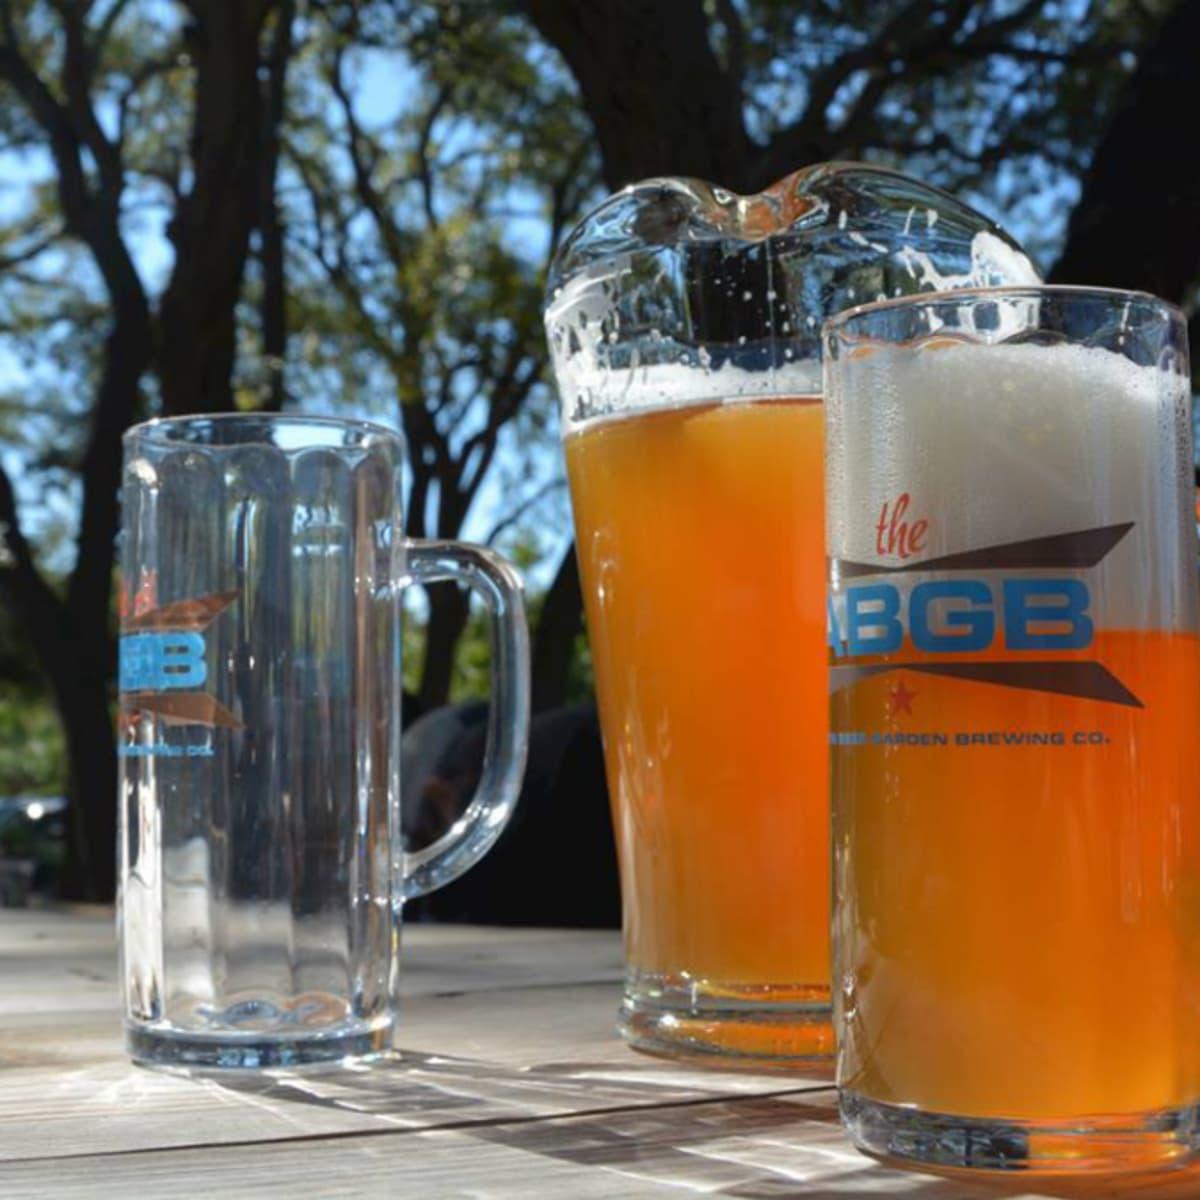 ABGB Austin Beer Garden and Brewery Fermentation Fest